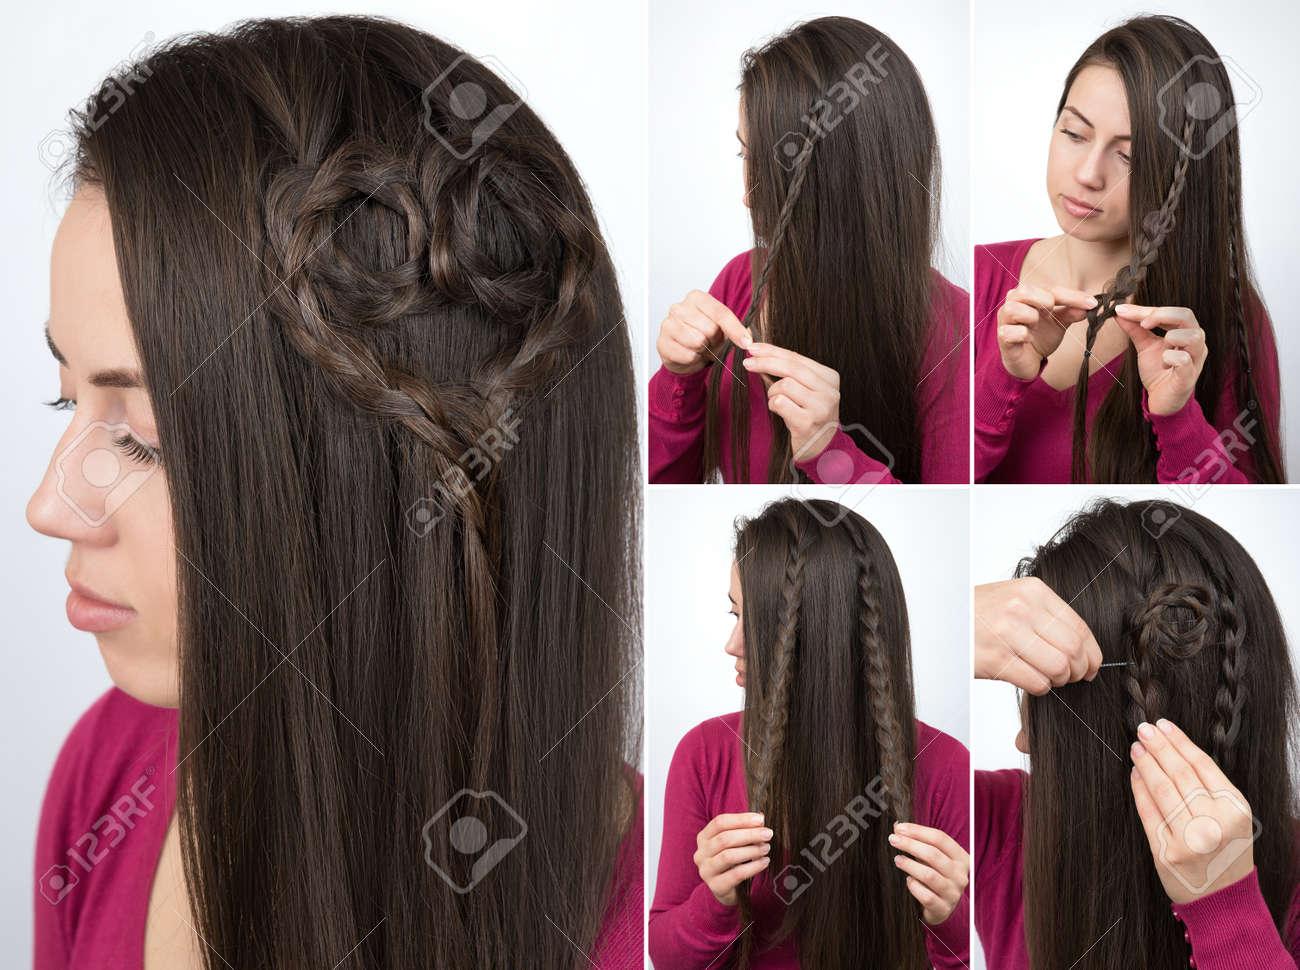 hairstyle braided heart tutorial - 75496275